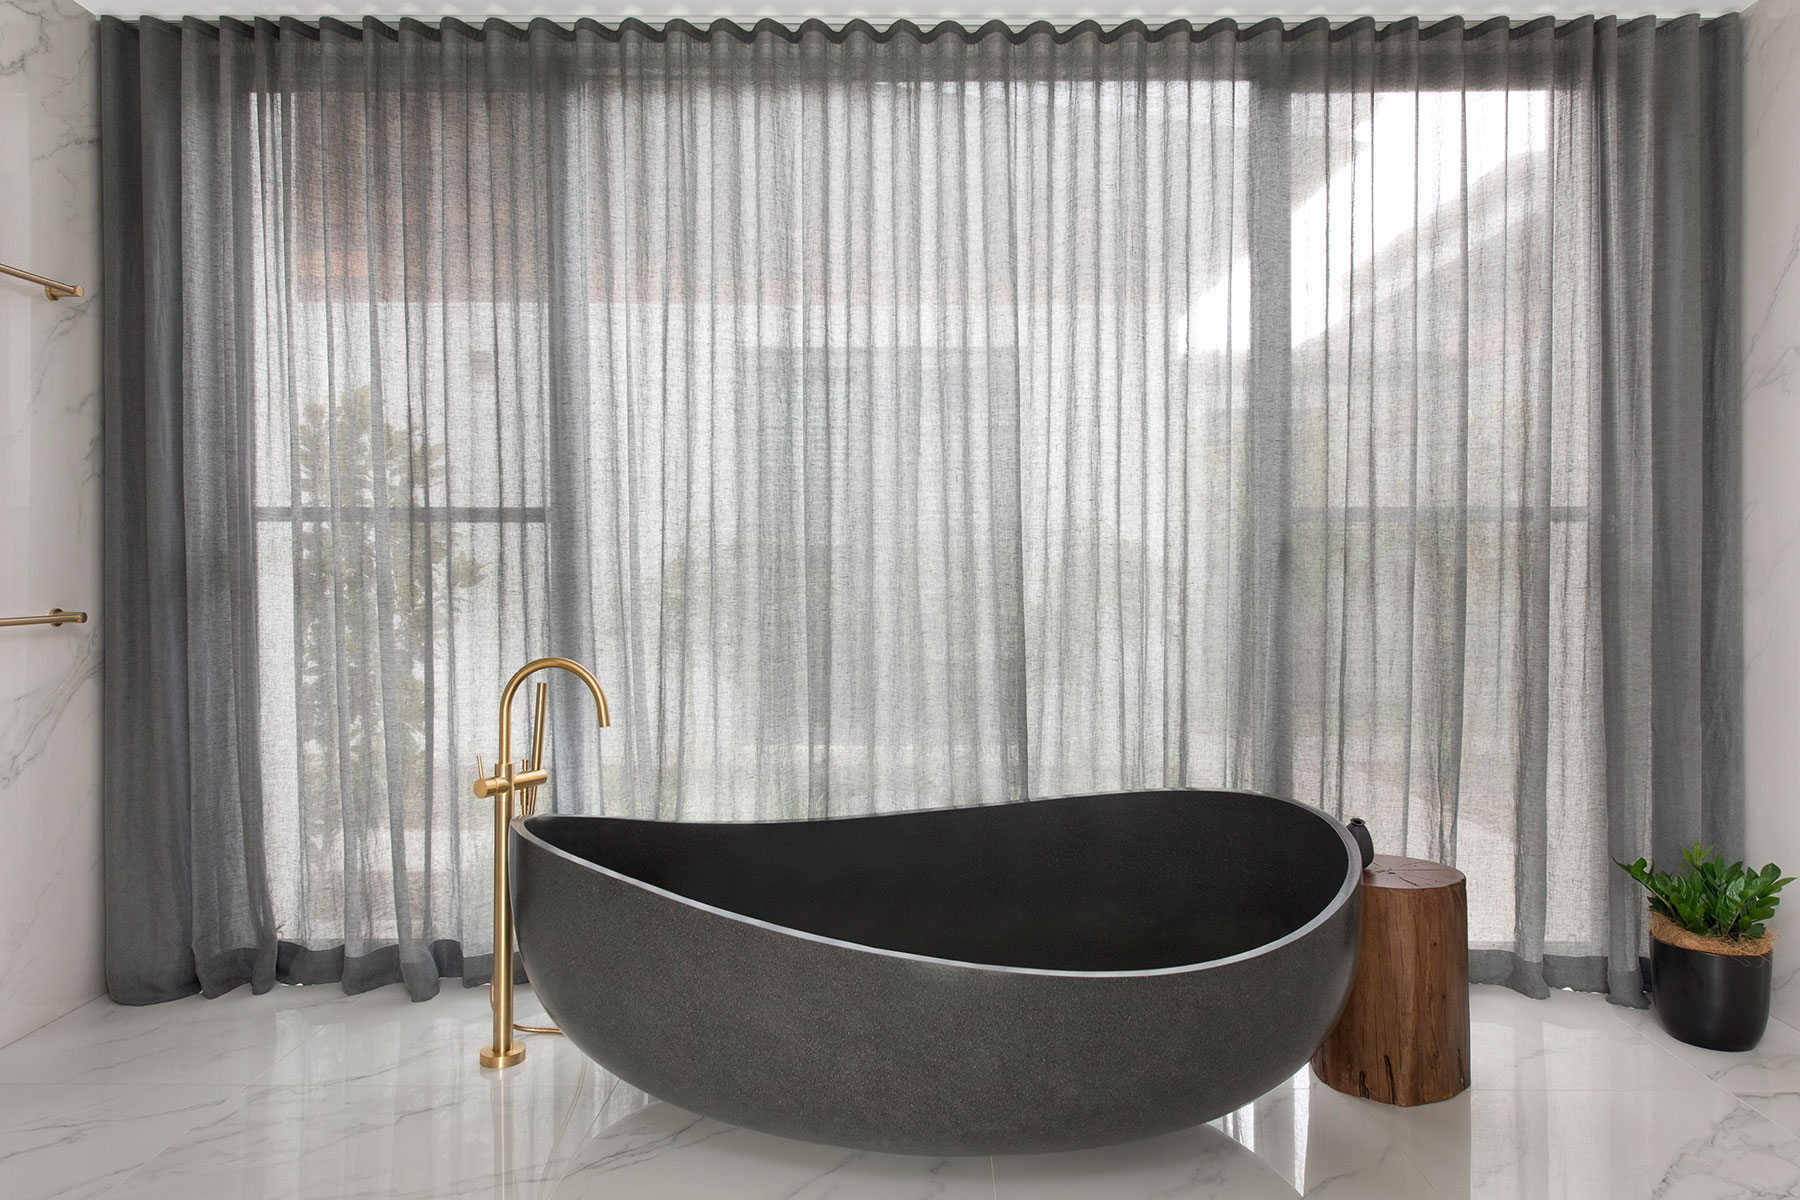 6 essentials for a perfect bathroom